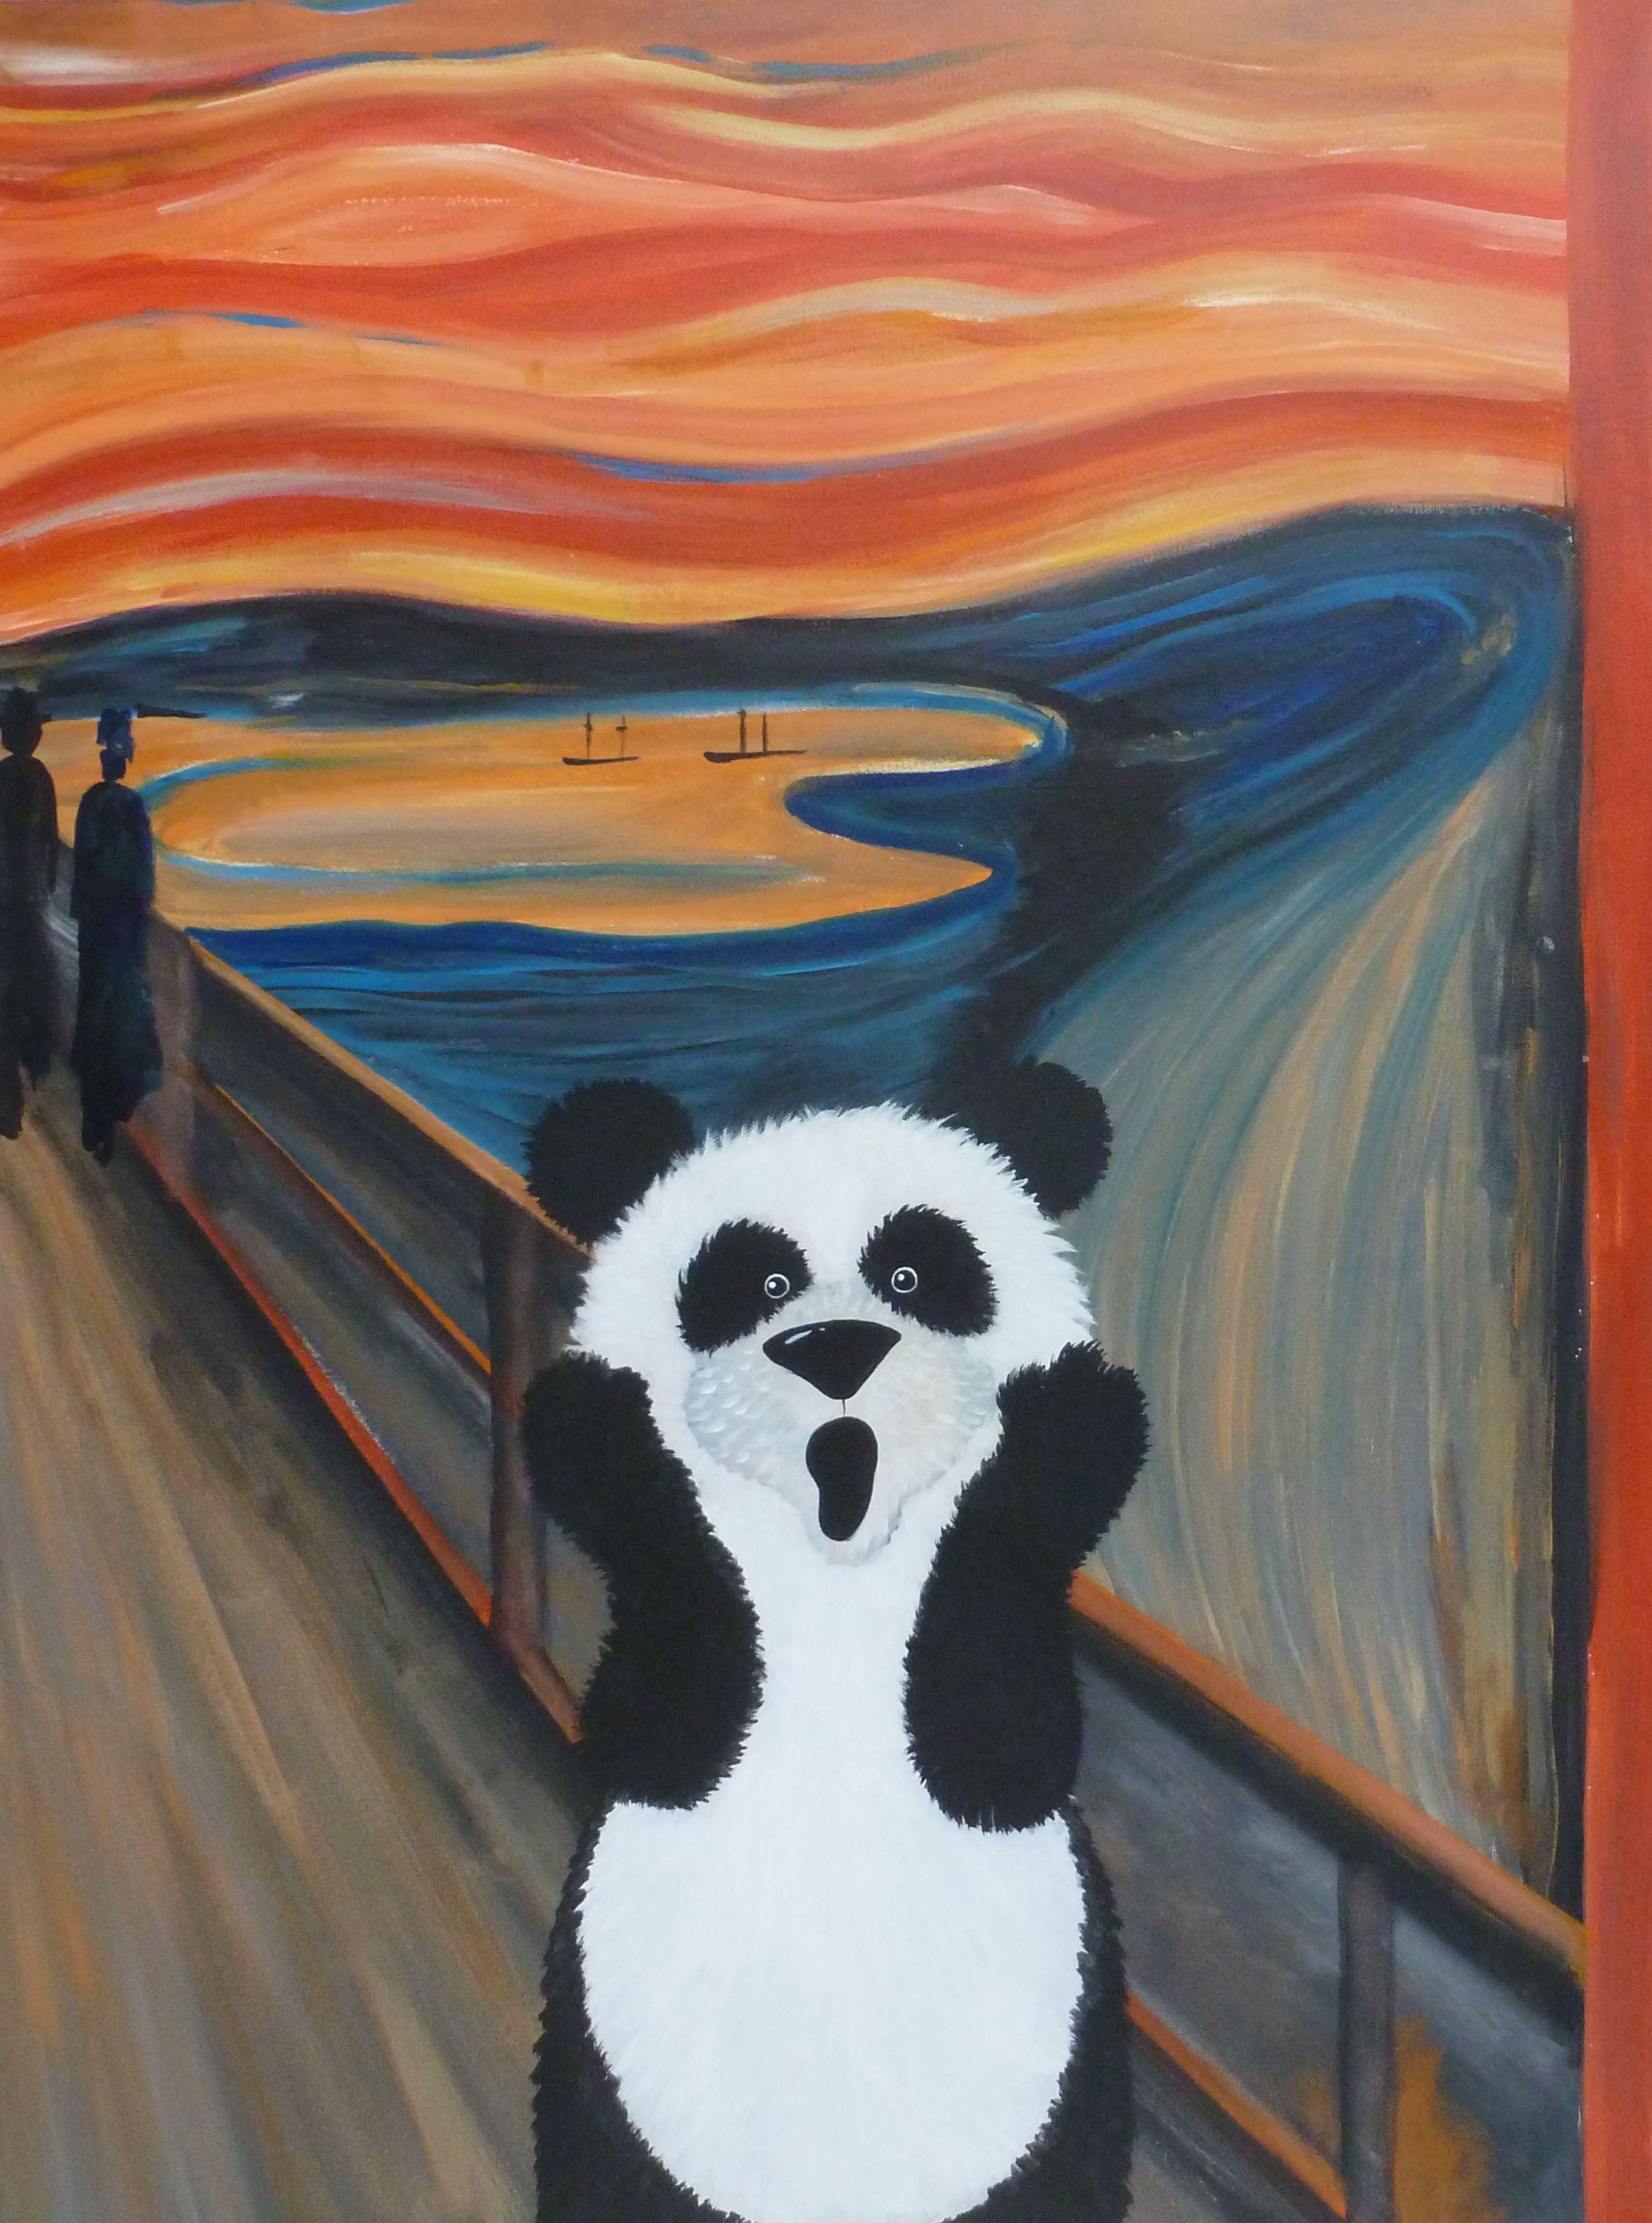 grote-kunst-voor-kleine-kenners | Kunst - Panda art, Art ...